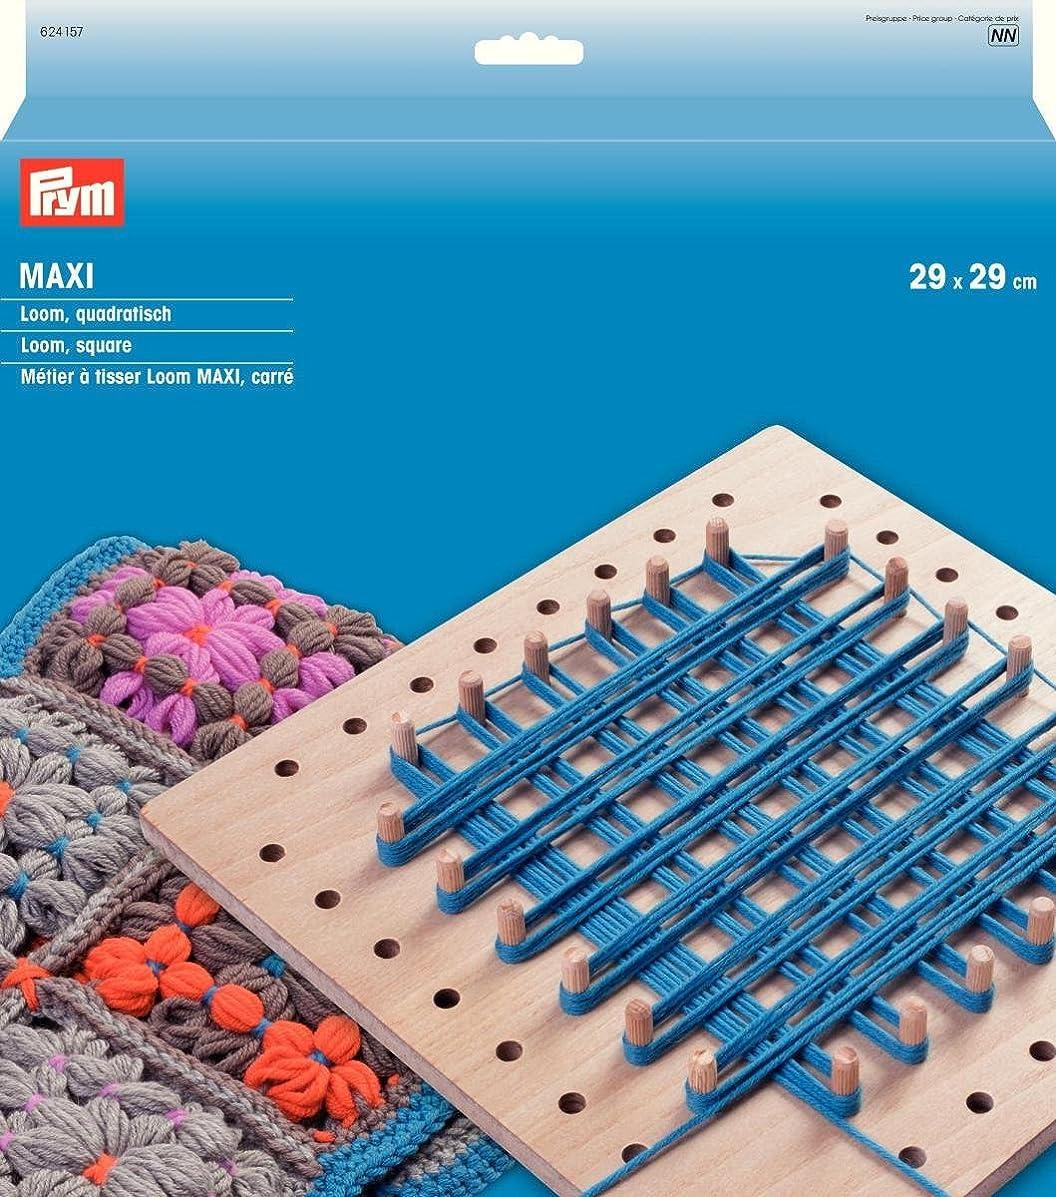 Prym 624157 | Square Maxi Loom